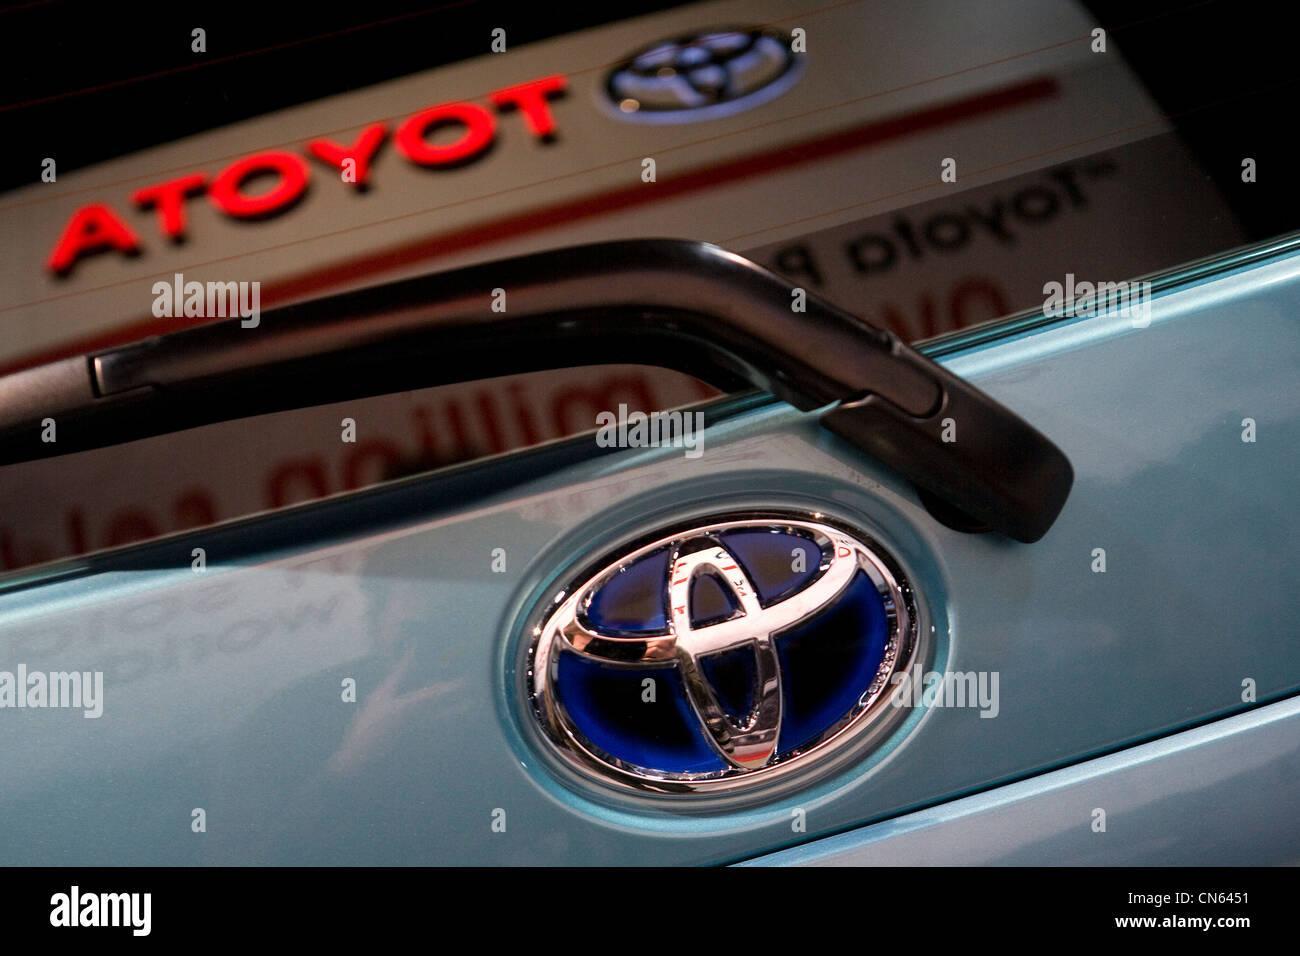 A Toyota Prius on display at the 2012 Washington Auto Show. - Stock Image